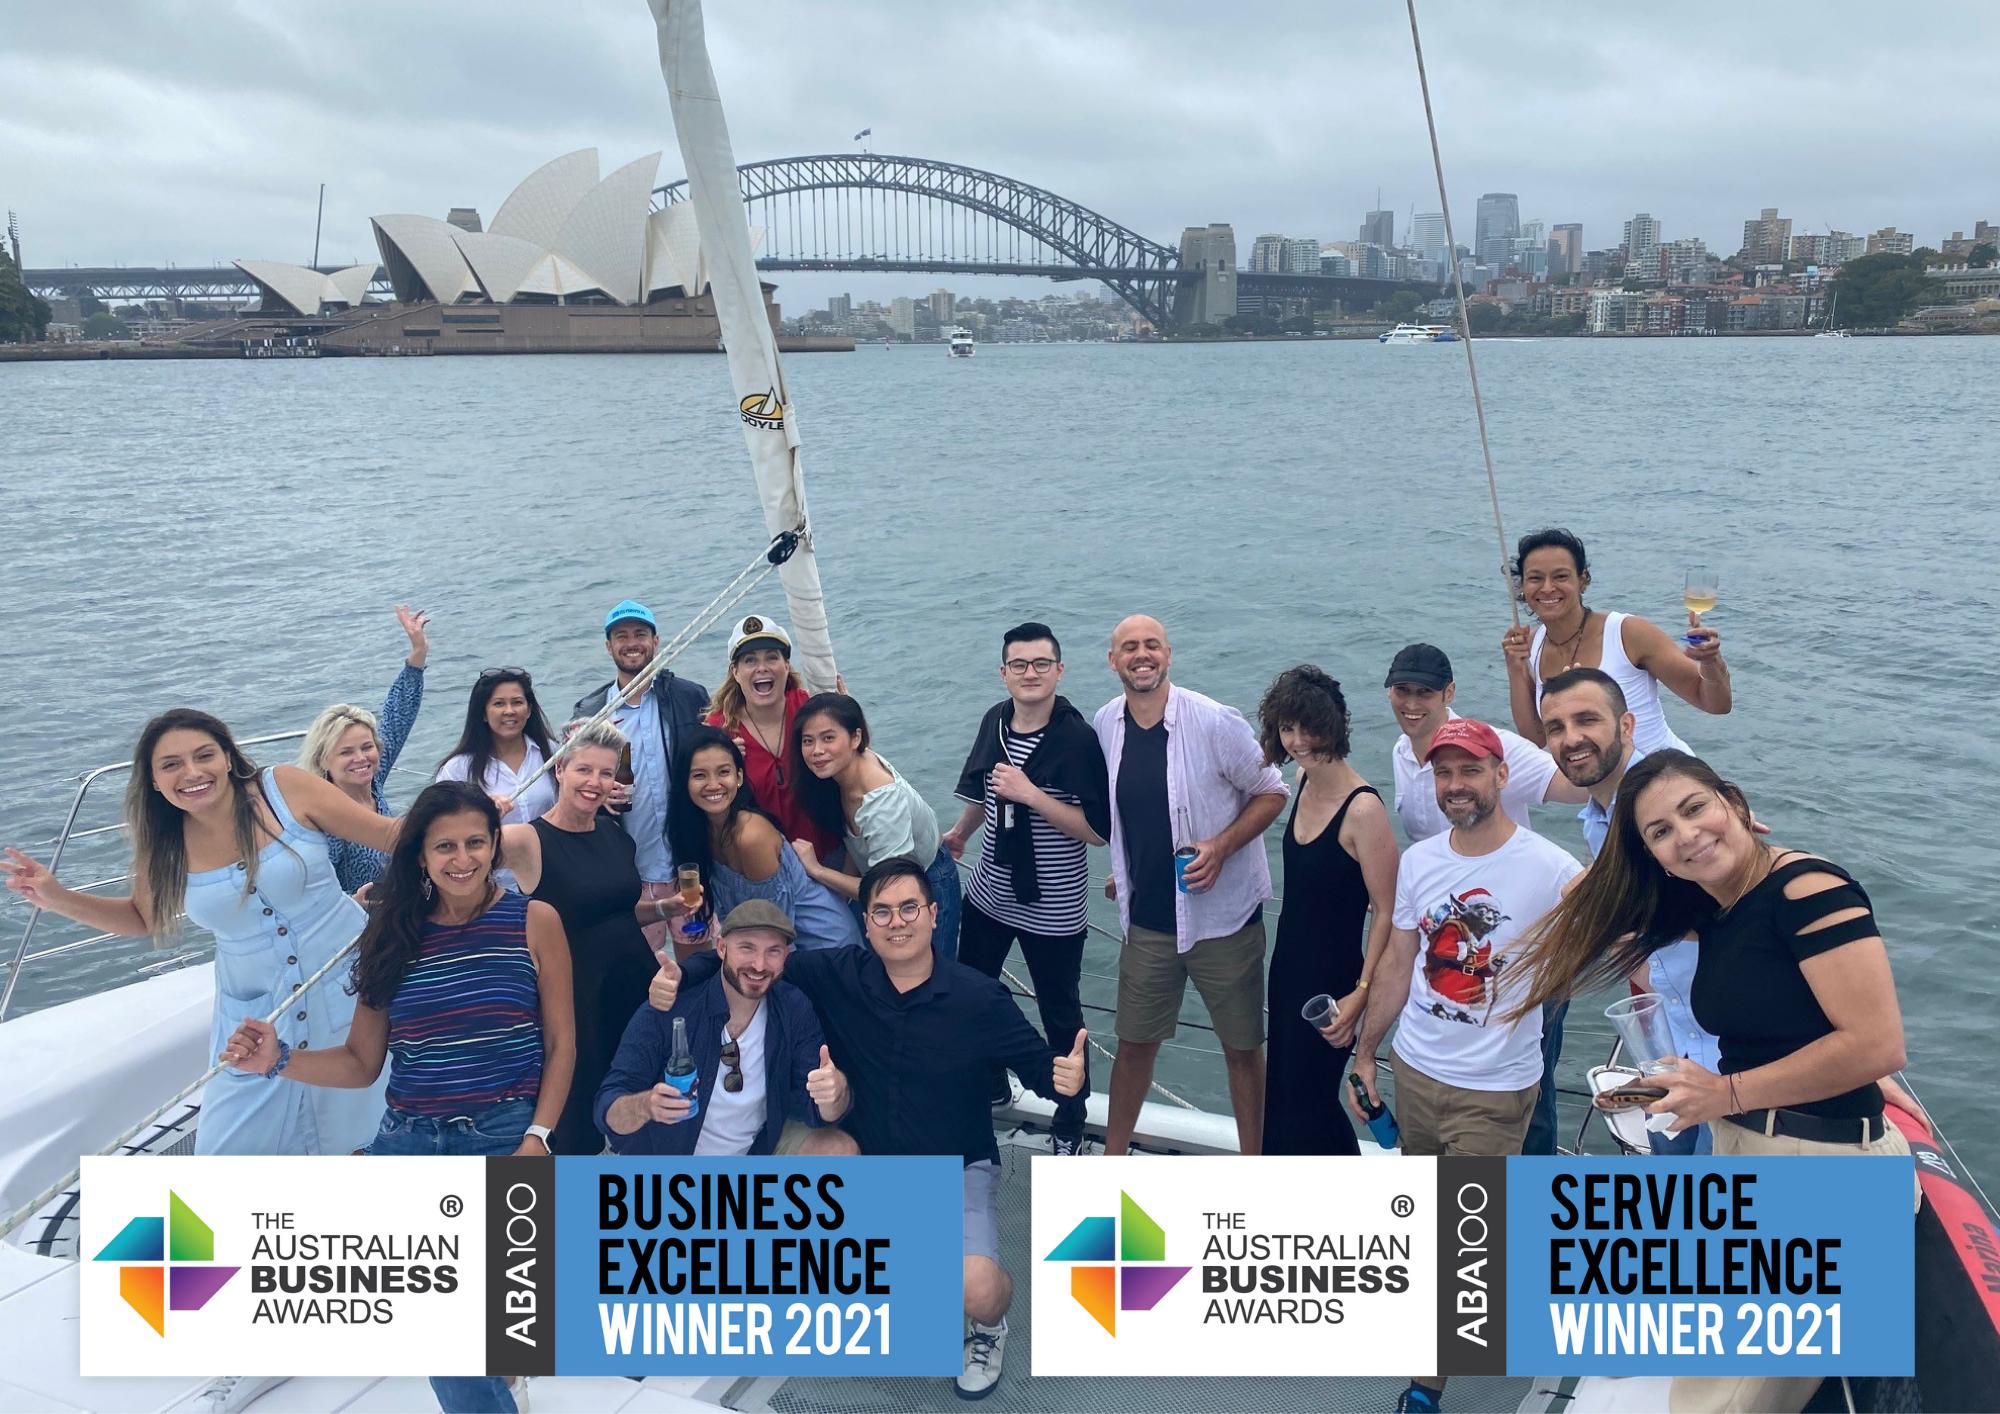 SES recognised as an ABA100 Winner in The Australian Business Awards 2021